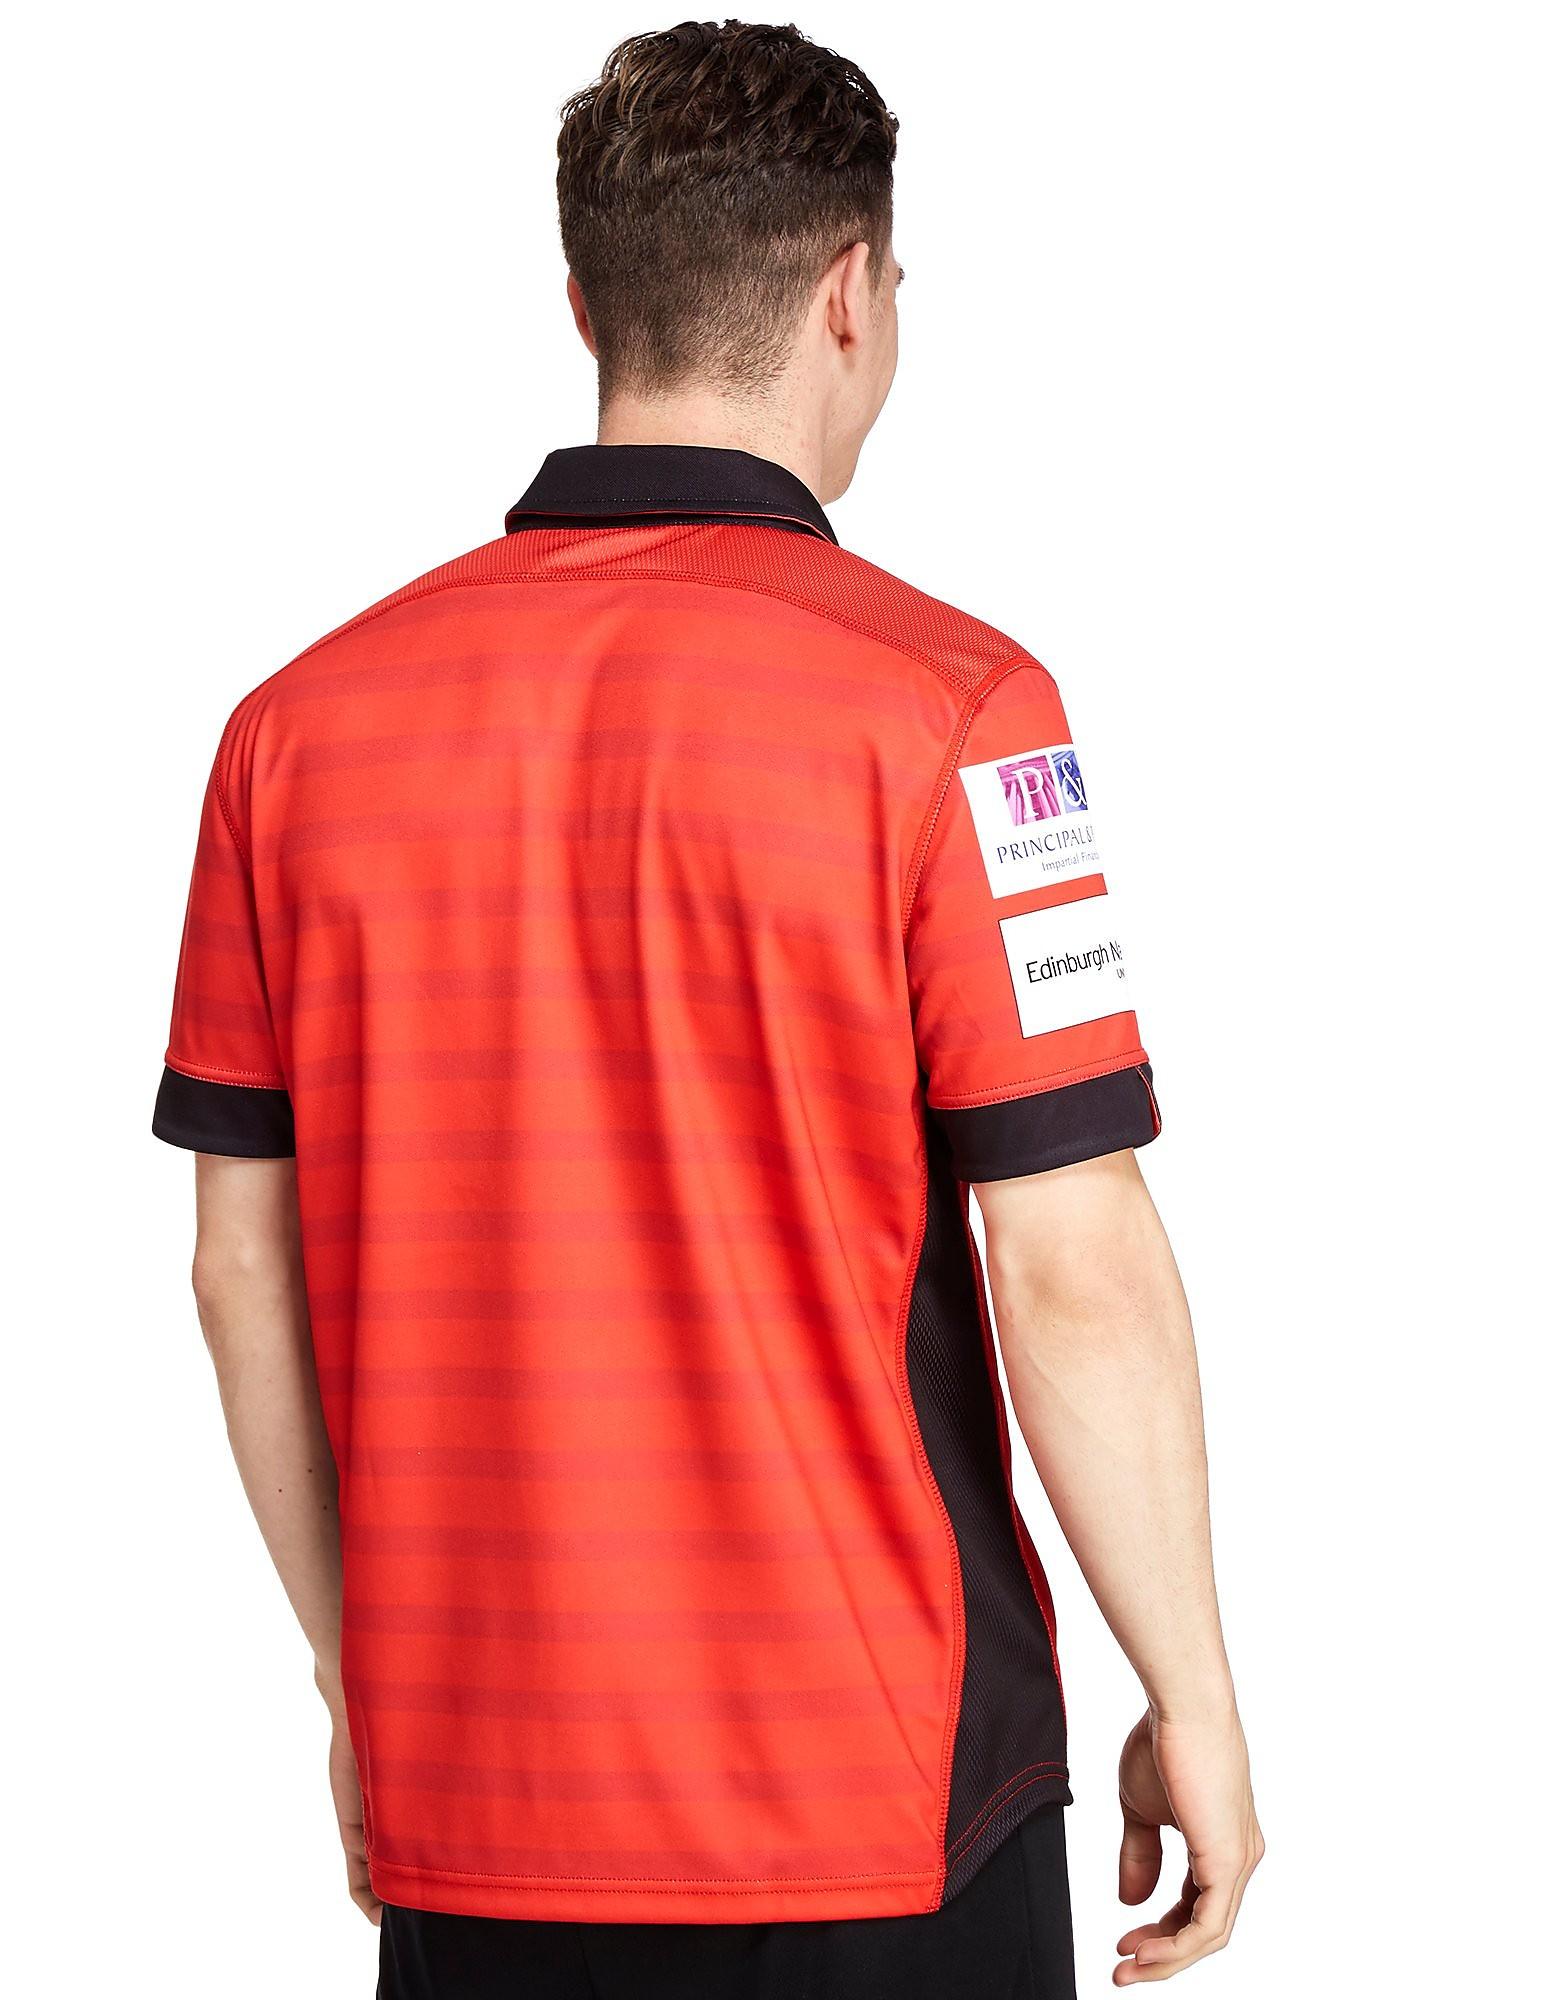 Macron Edinburgh RFU 2016/17 Away Shirt